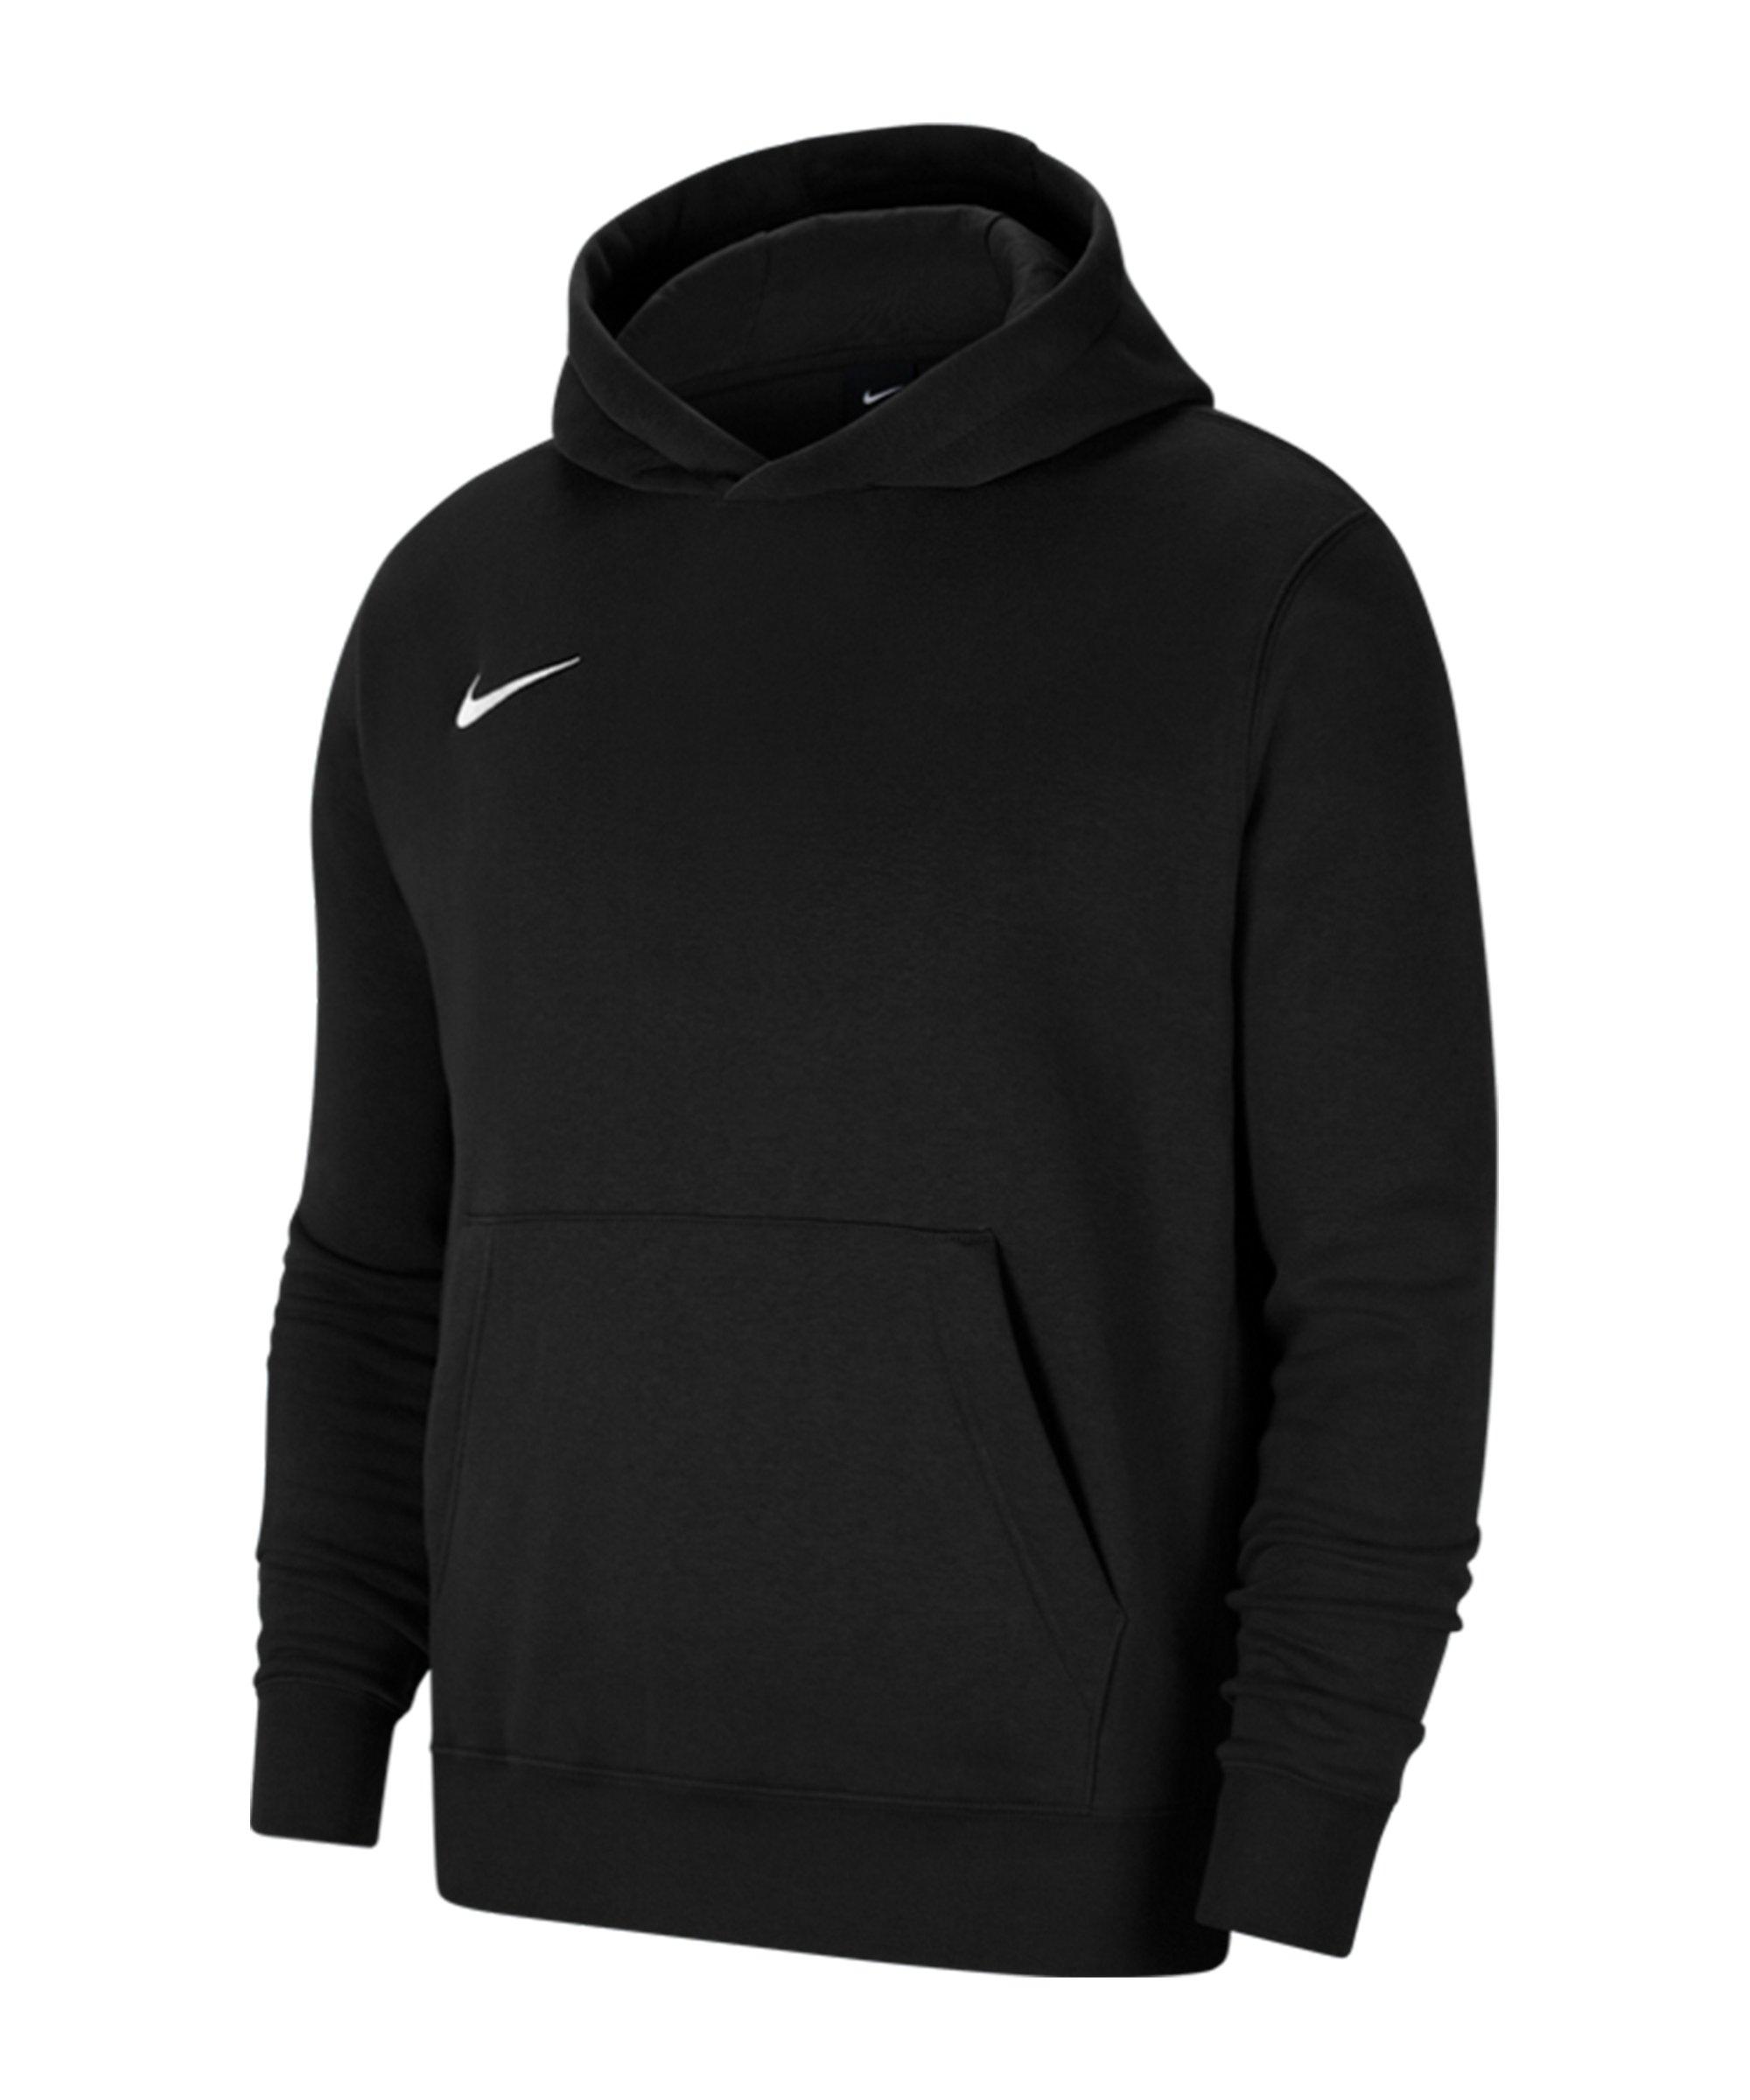 Nike Park 20 Fleece Hoody Kids Schwarz Weiss F010 - schwarz